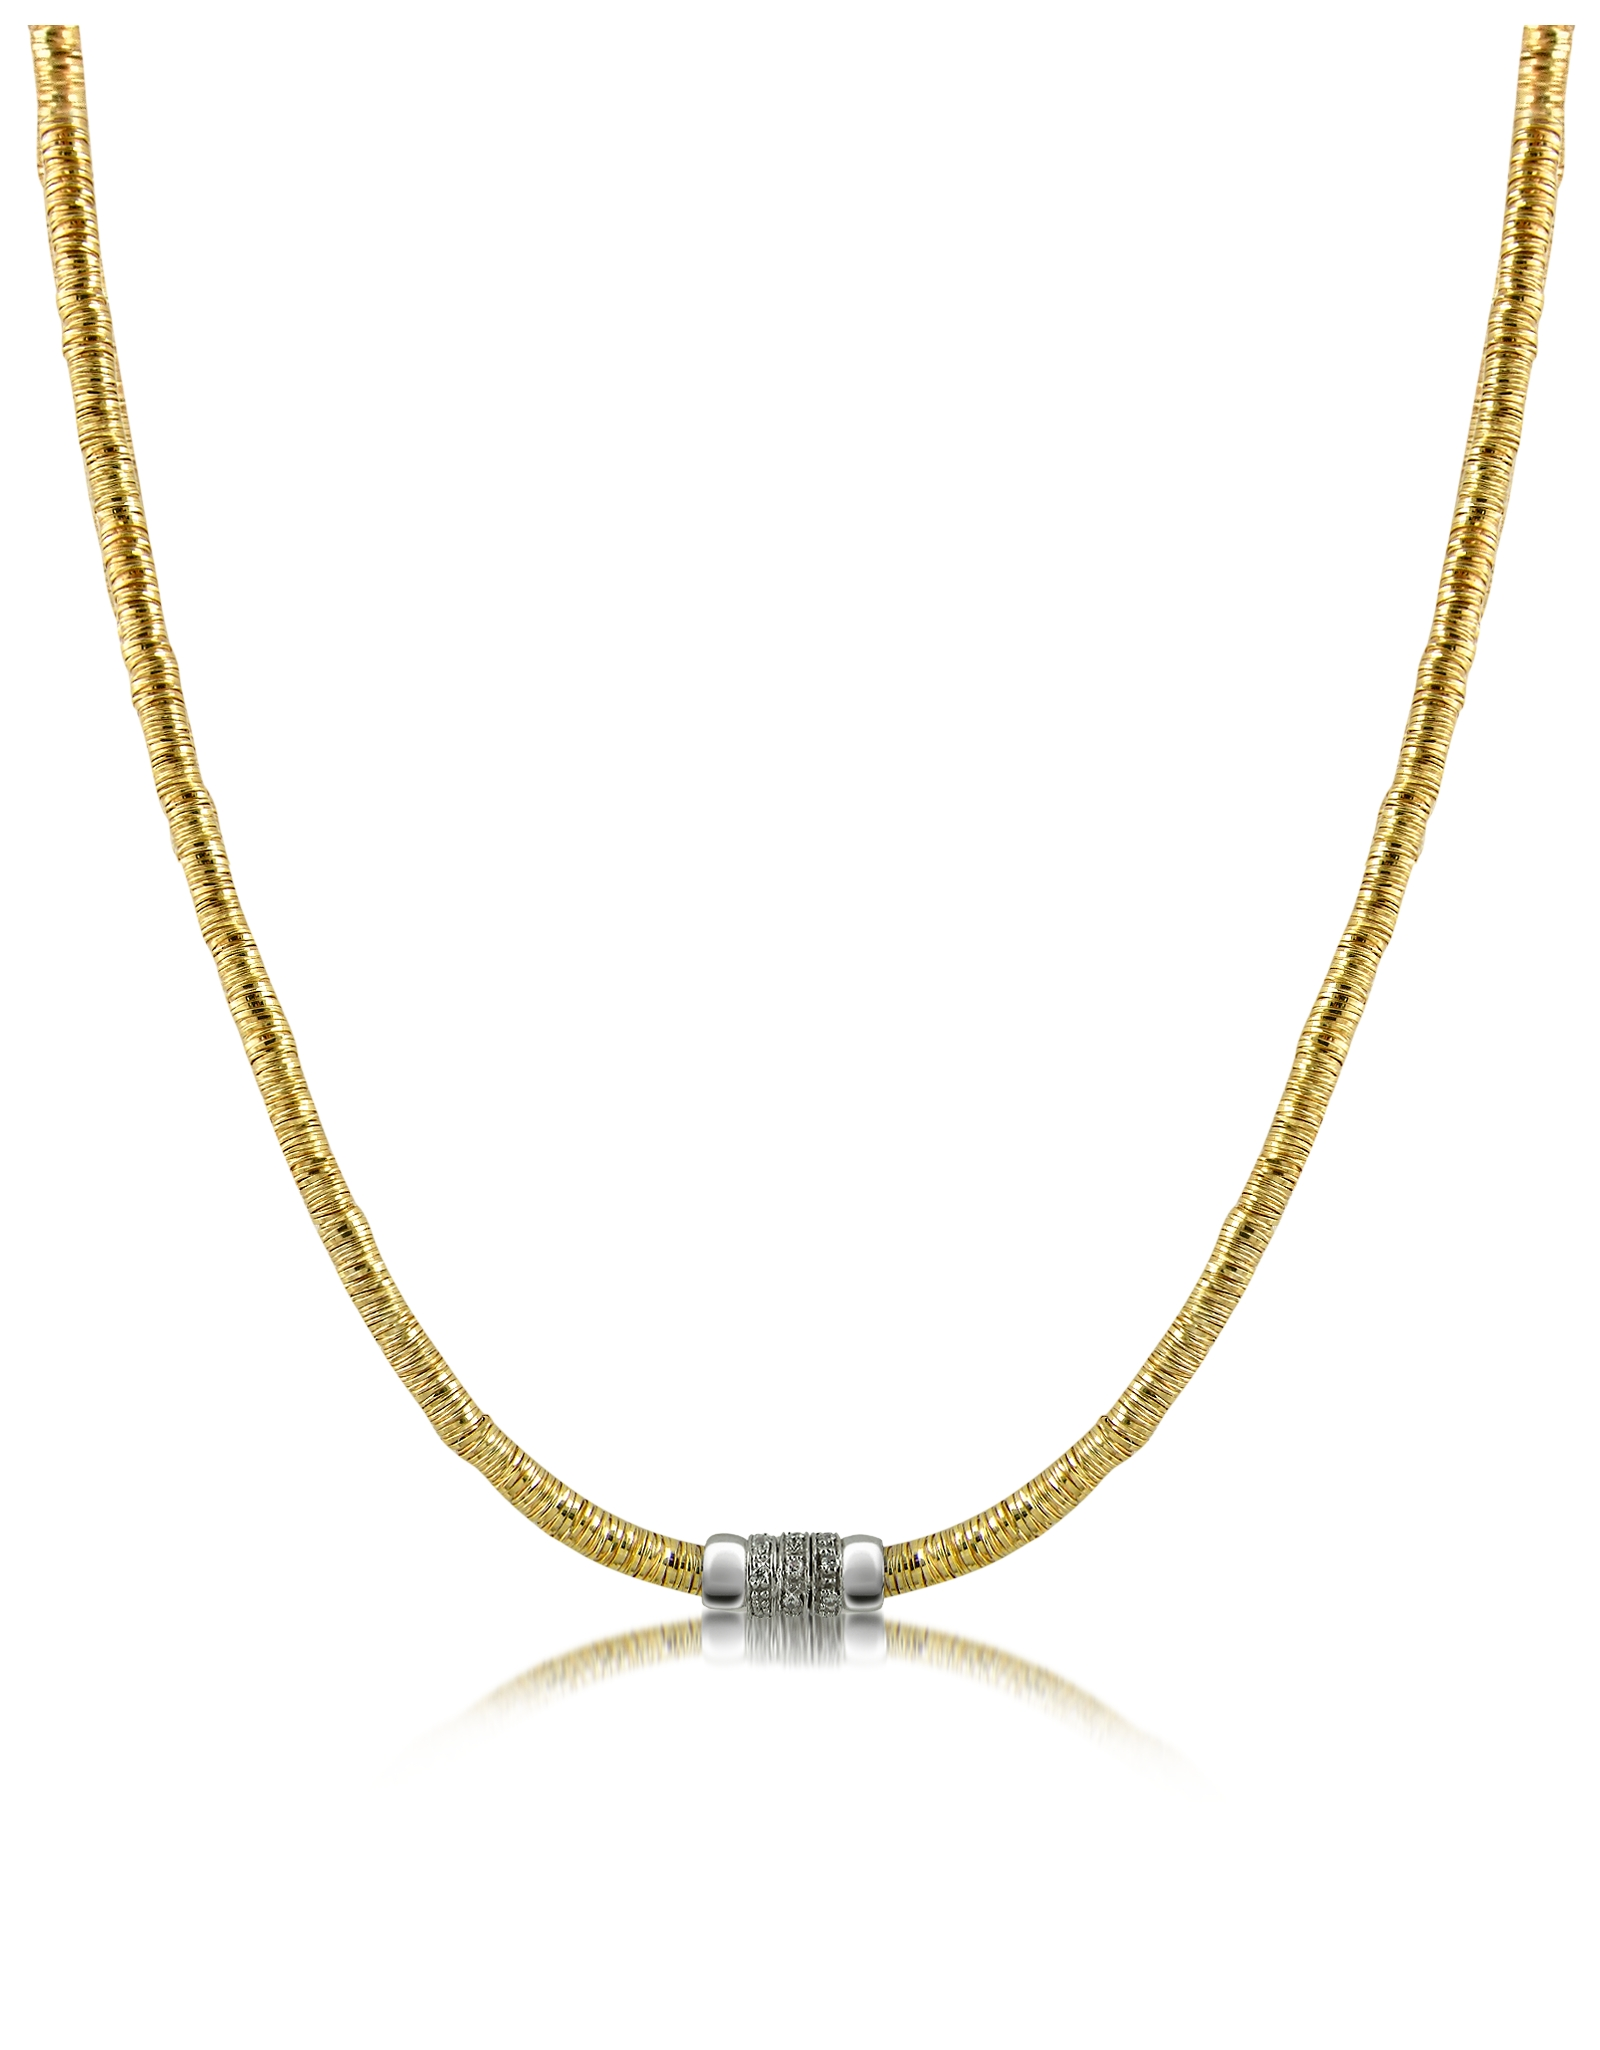 orlando orlandini capriccio diamond 18k gold chain snake. Black Bedroom Furniture Sets. Home Design Ideas